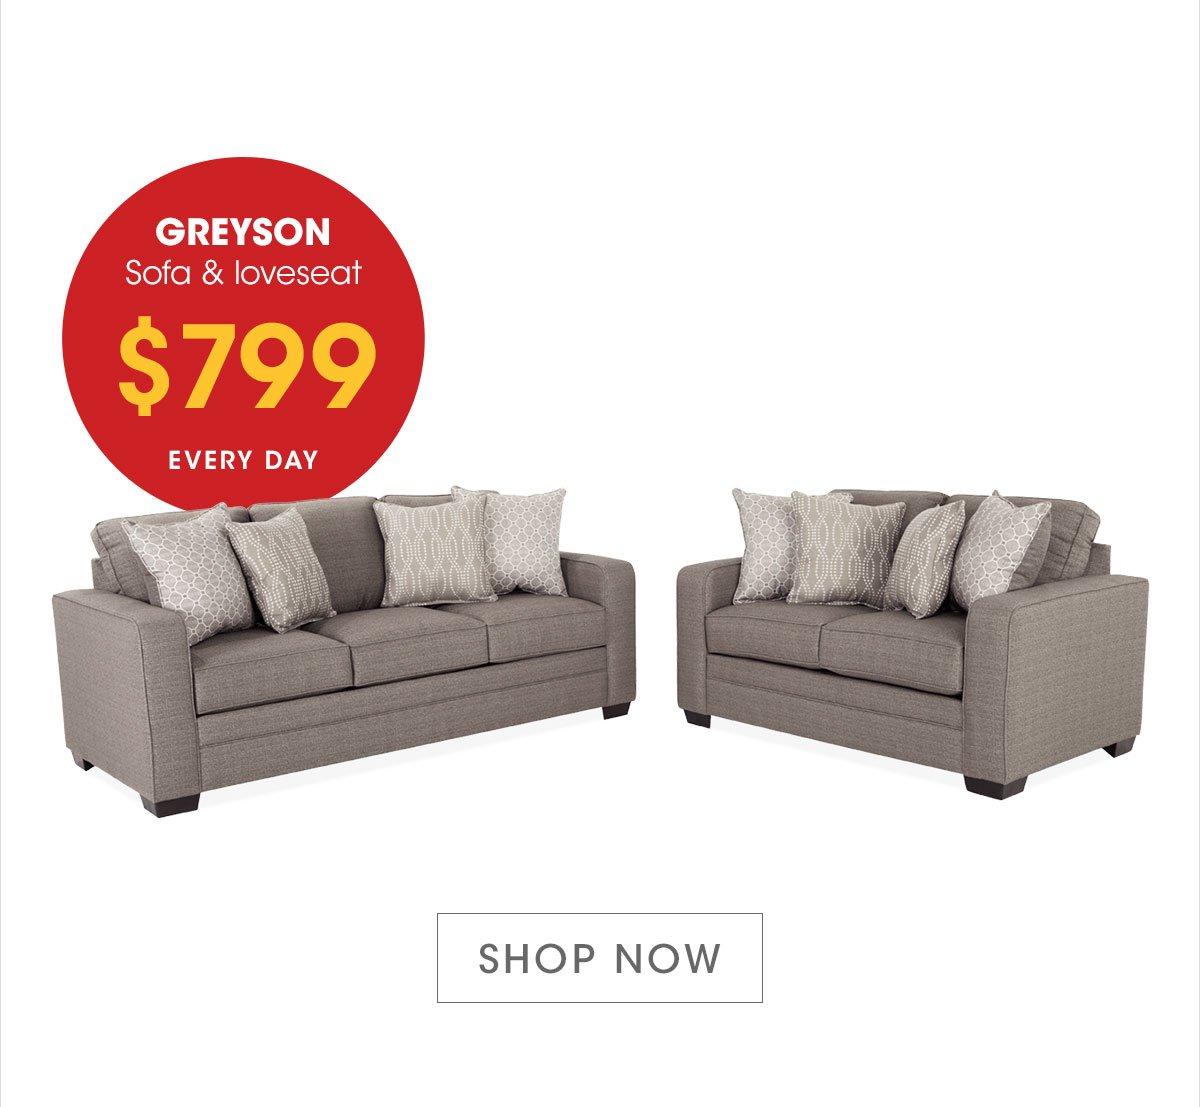 Amazing Bobs Discount Furniture My Greyson Complete Living Room Set Machost Co Dining Chair Design Ideas Machostcouk